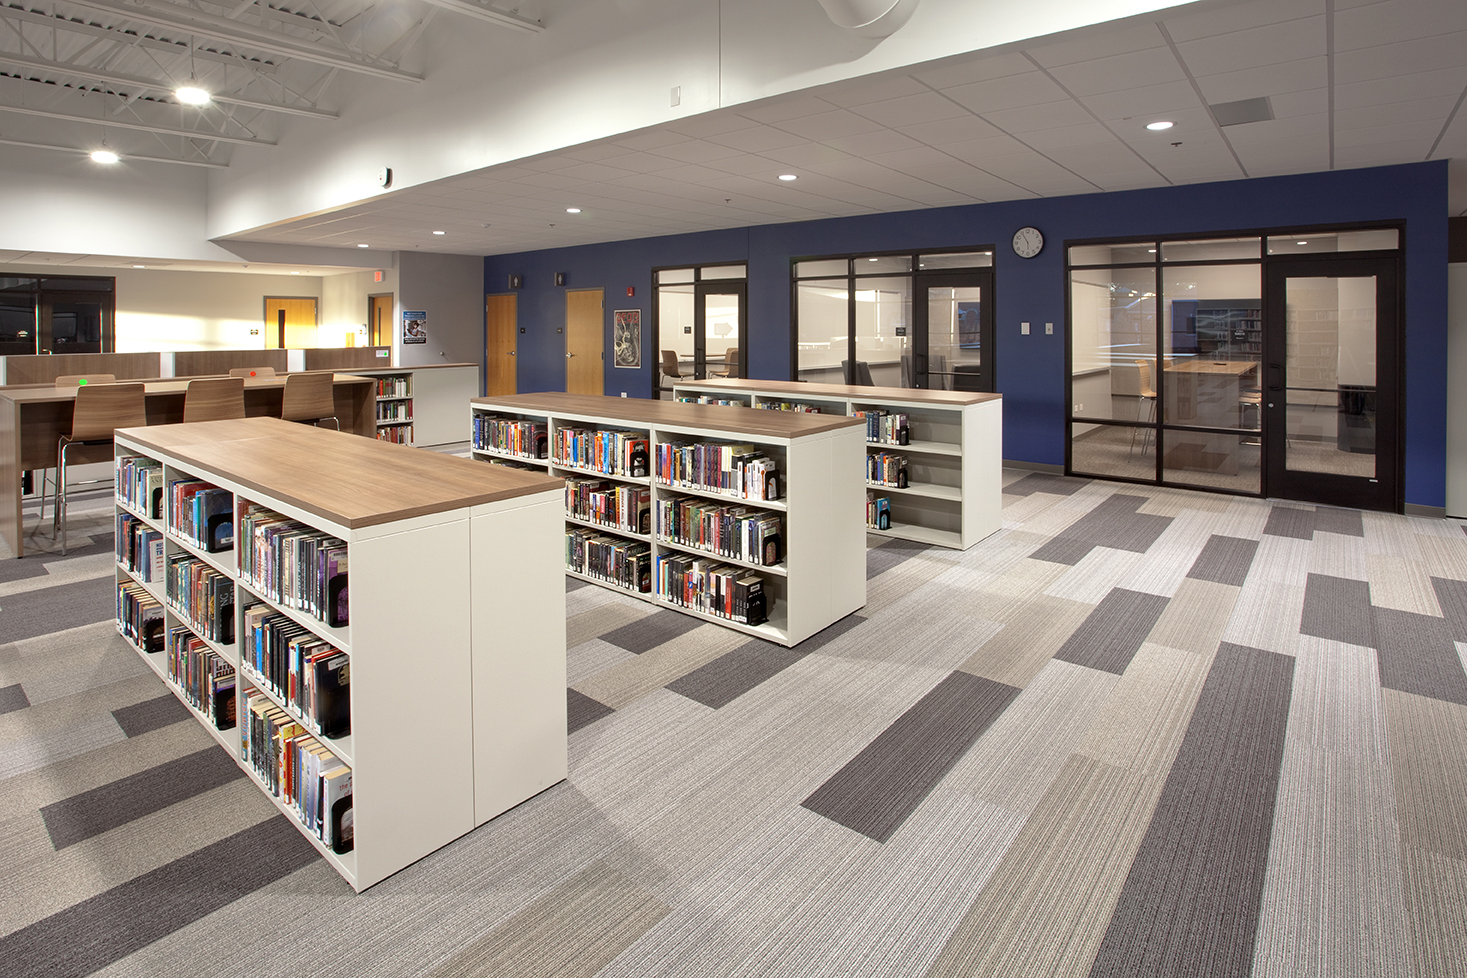 benet-academy-library-3-lo